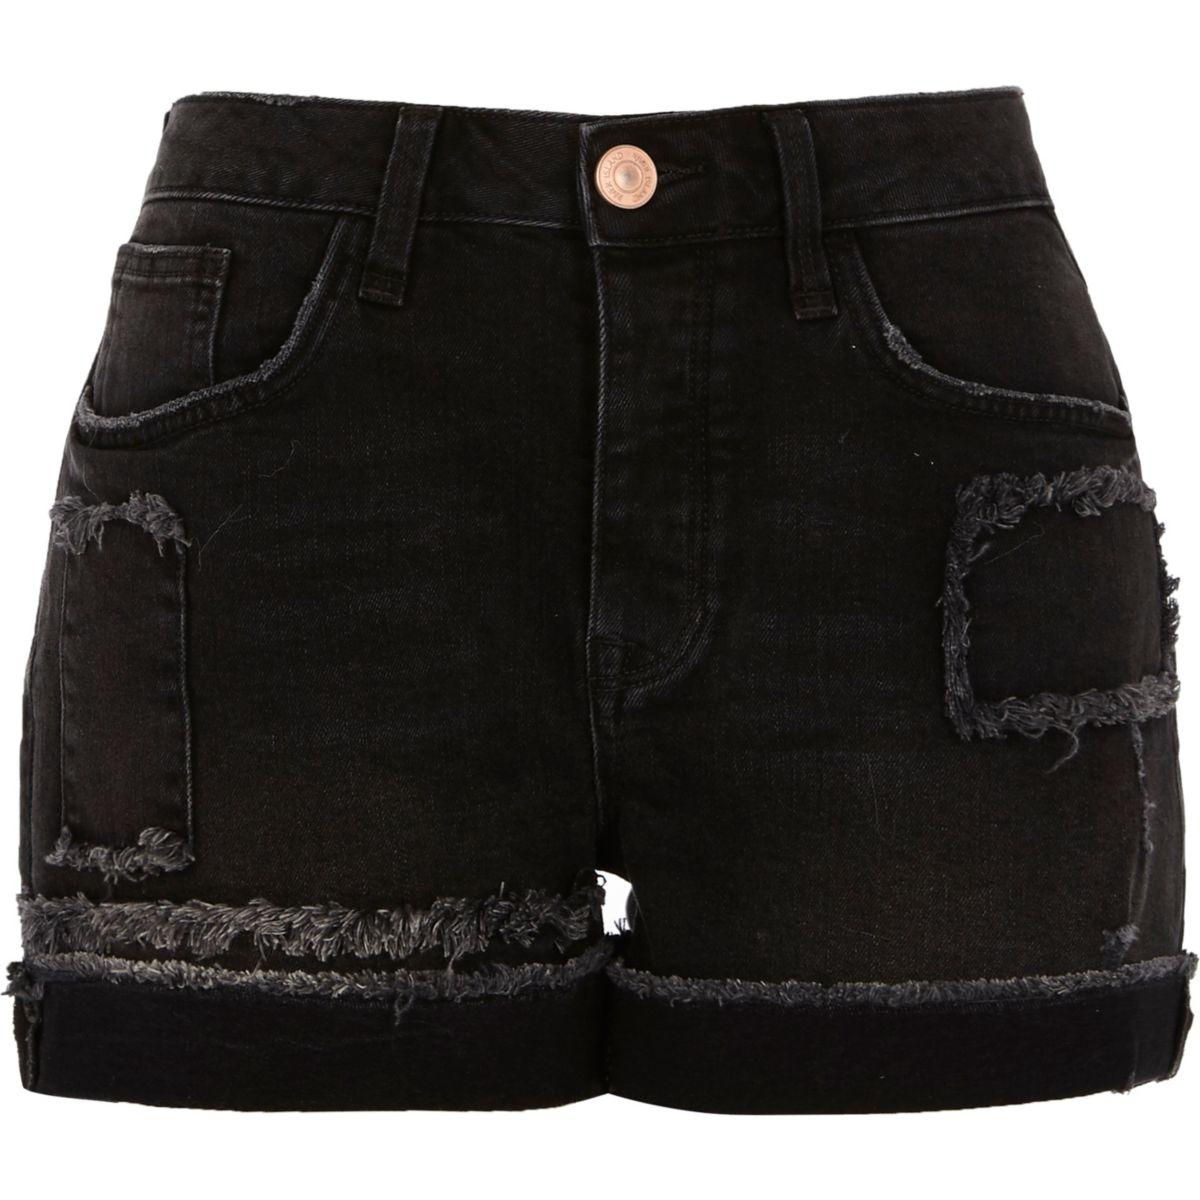 Washed black frayed patch boyfriend shorts